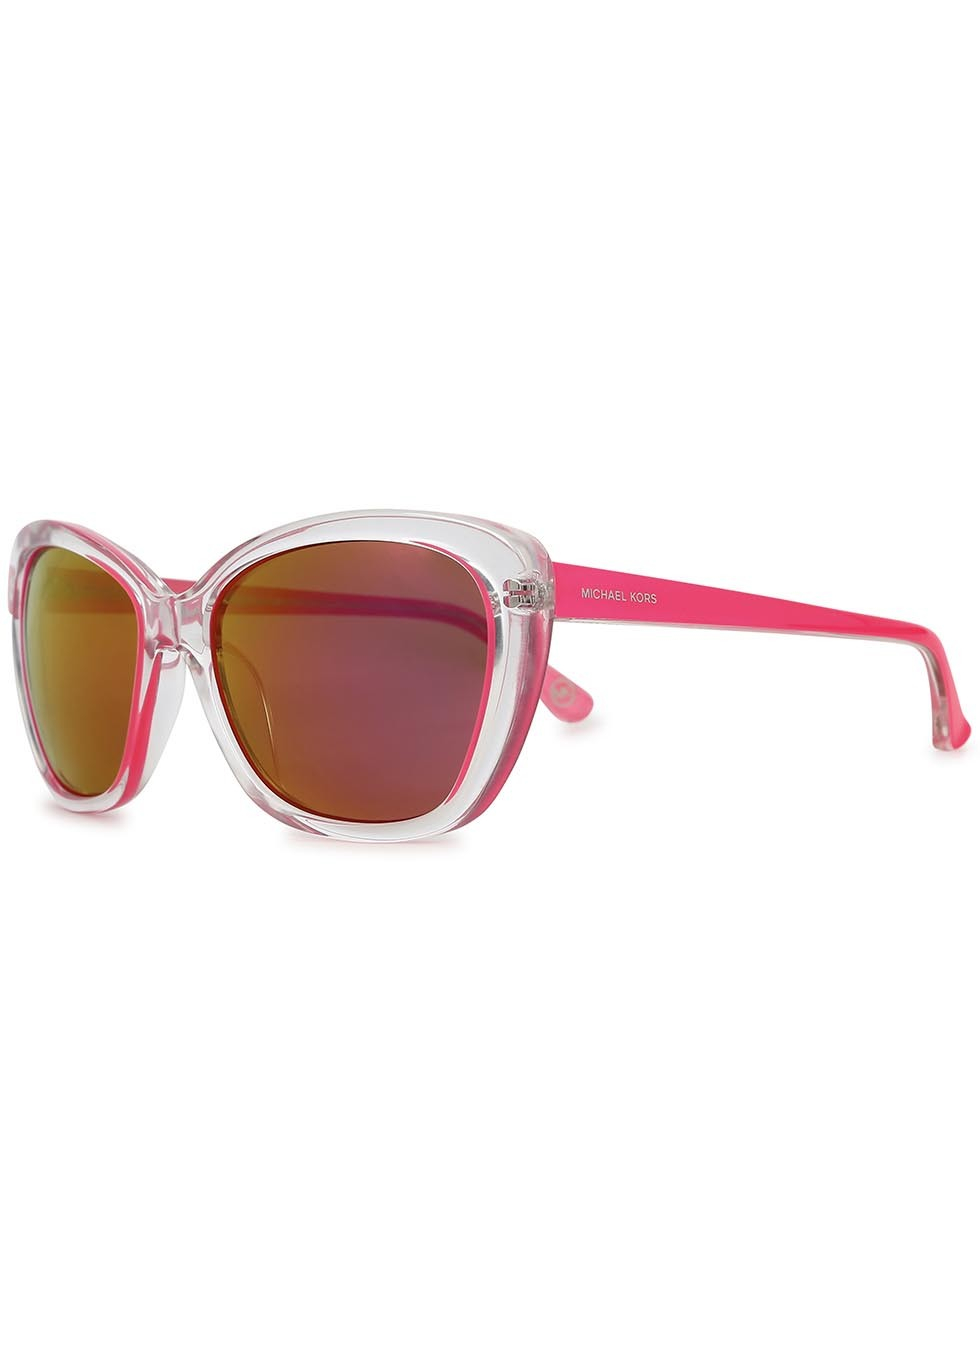 8a454a2cba49e Michael Kors Sabrina Cat Eye Acetate Sunglasses in Pink - Lyst